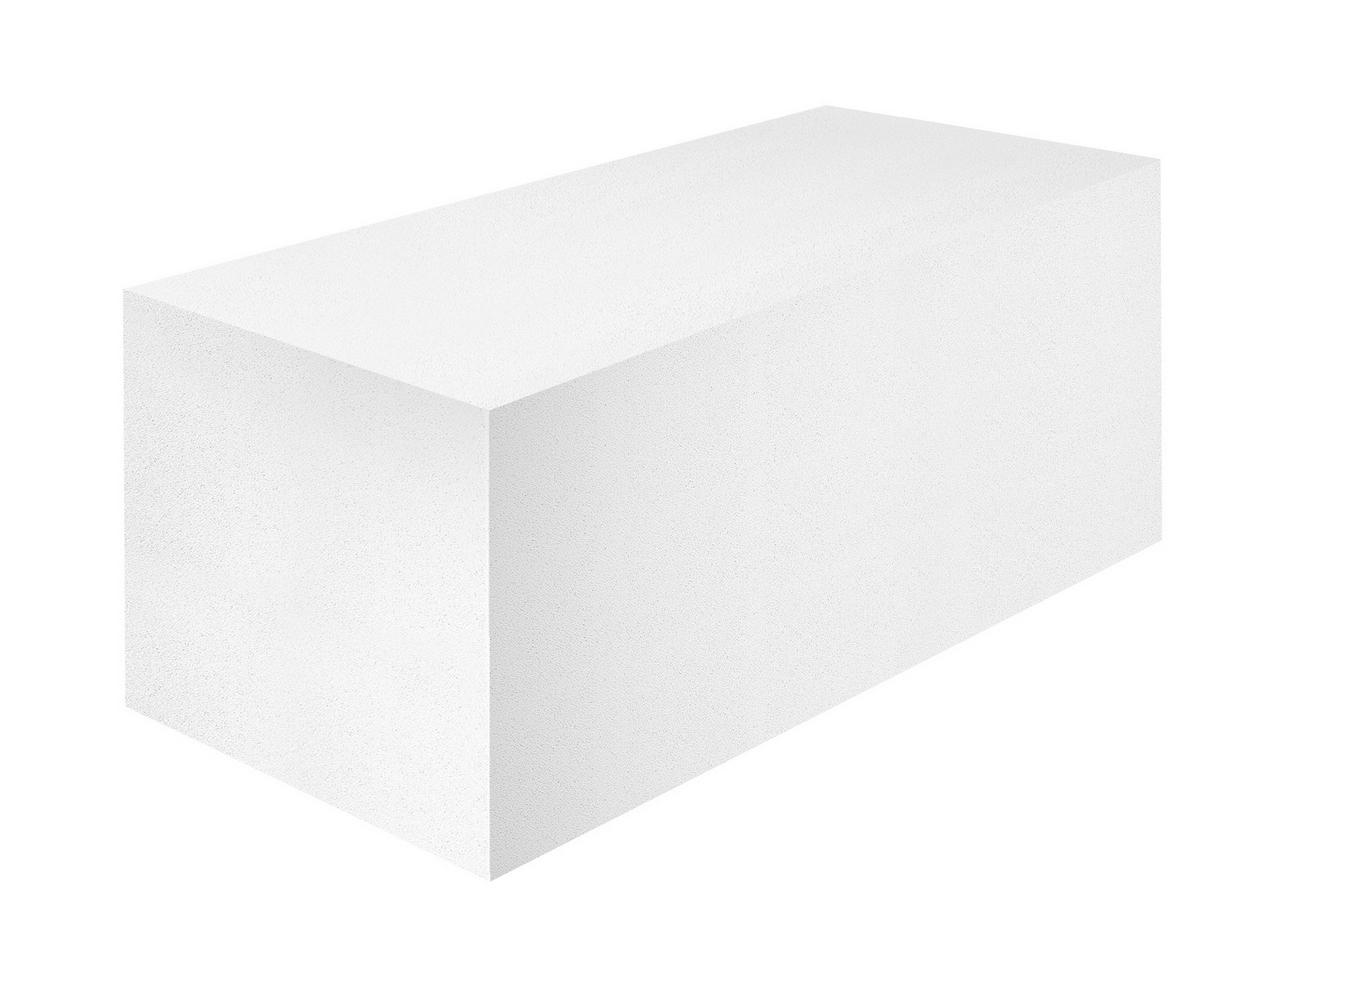 Tvárnice YTONG Statik Plus P6-650 hladká 250×249×499 mm